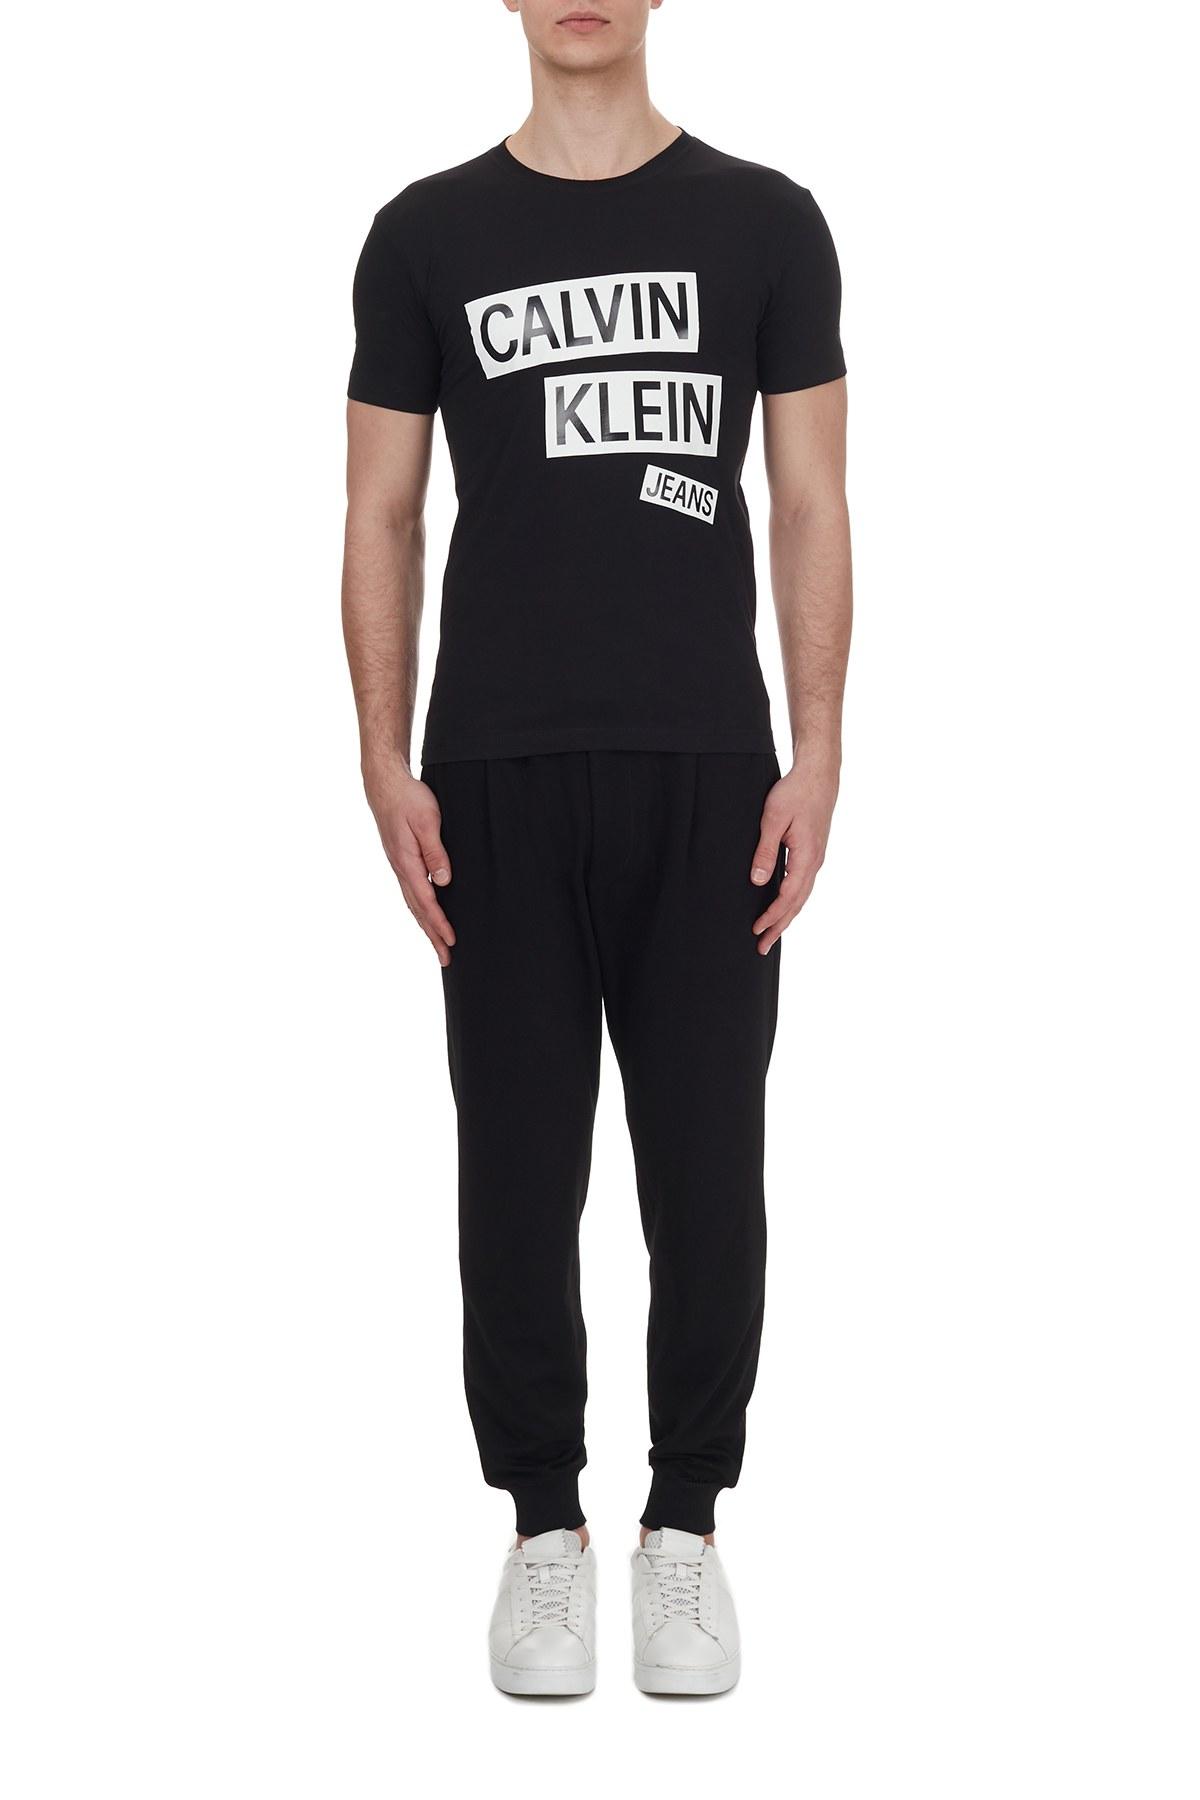 Calvin Klein Logo Baskılı Bisiklet Yaka % 100 Pamuk Erkek T Shirt J30J316483 BEH SİYAH